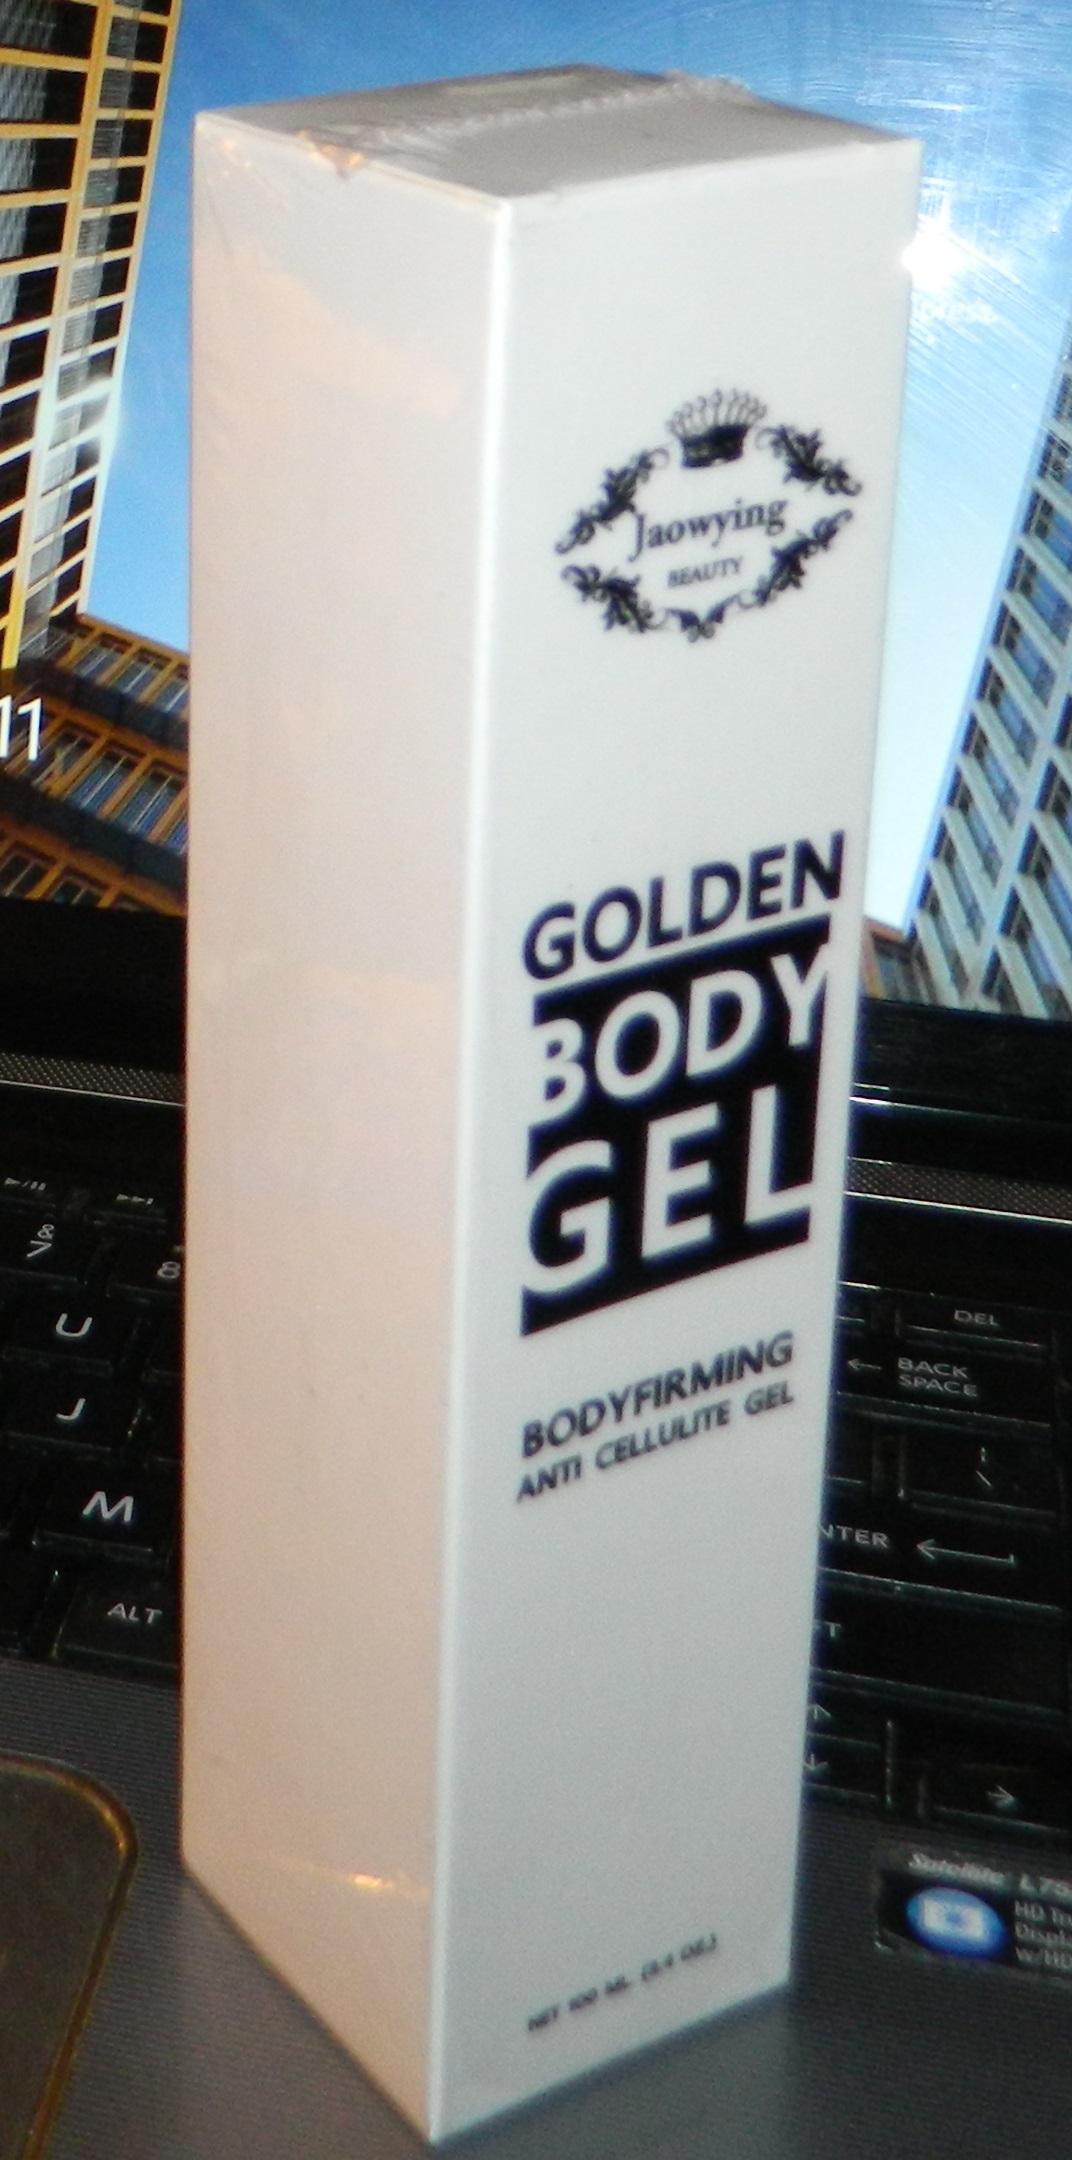 Golden Anti Cellulite Gel